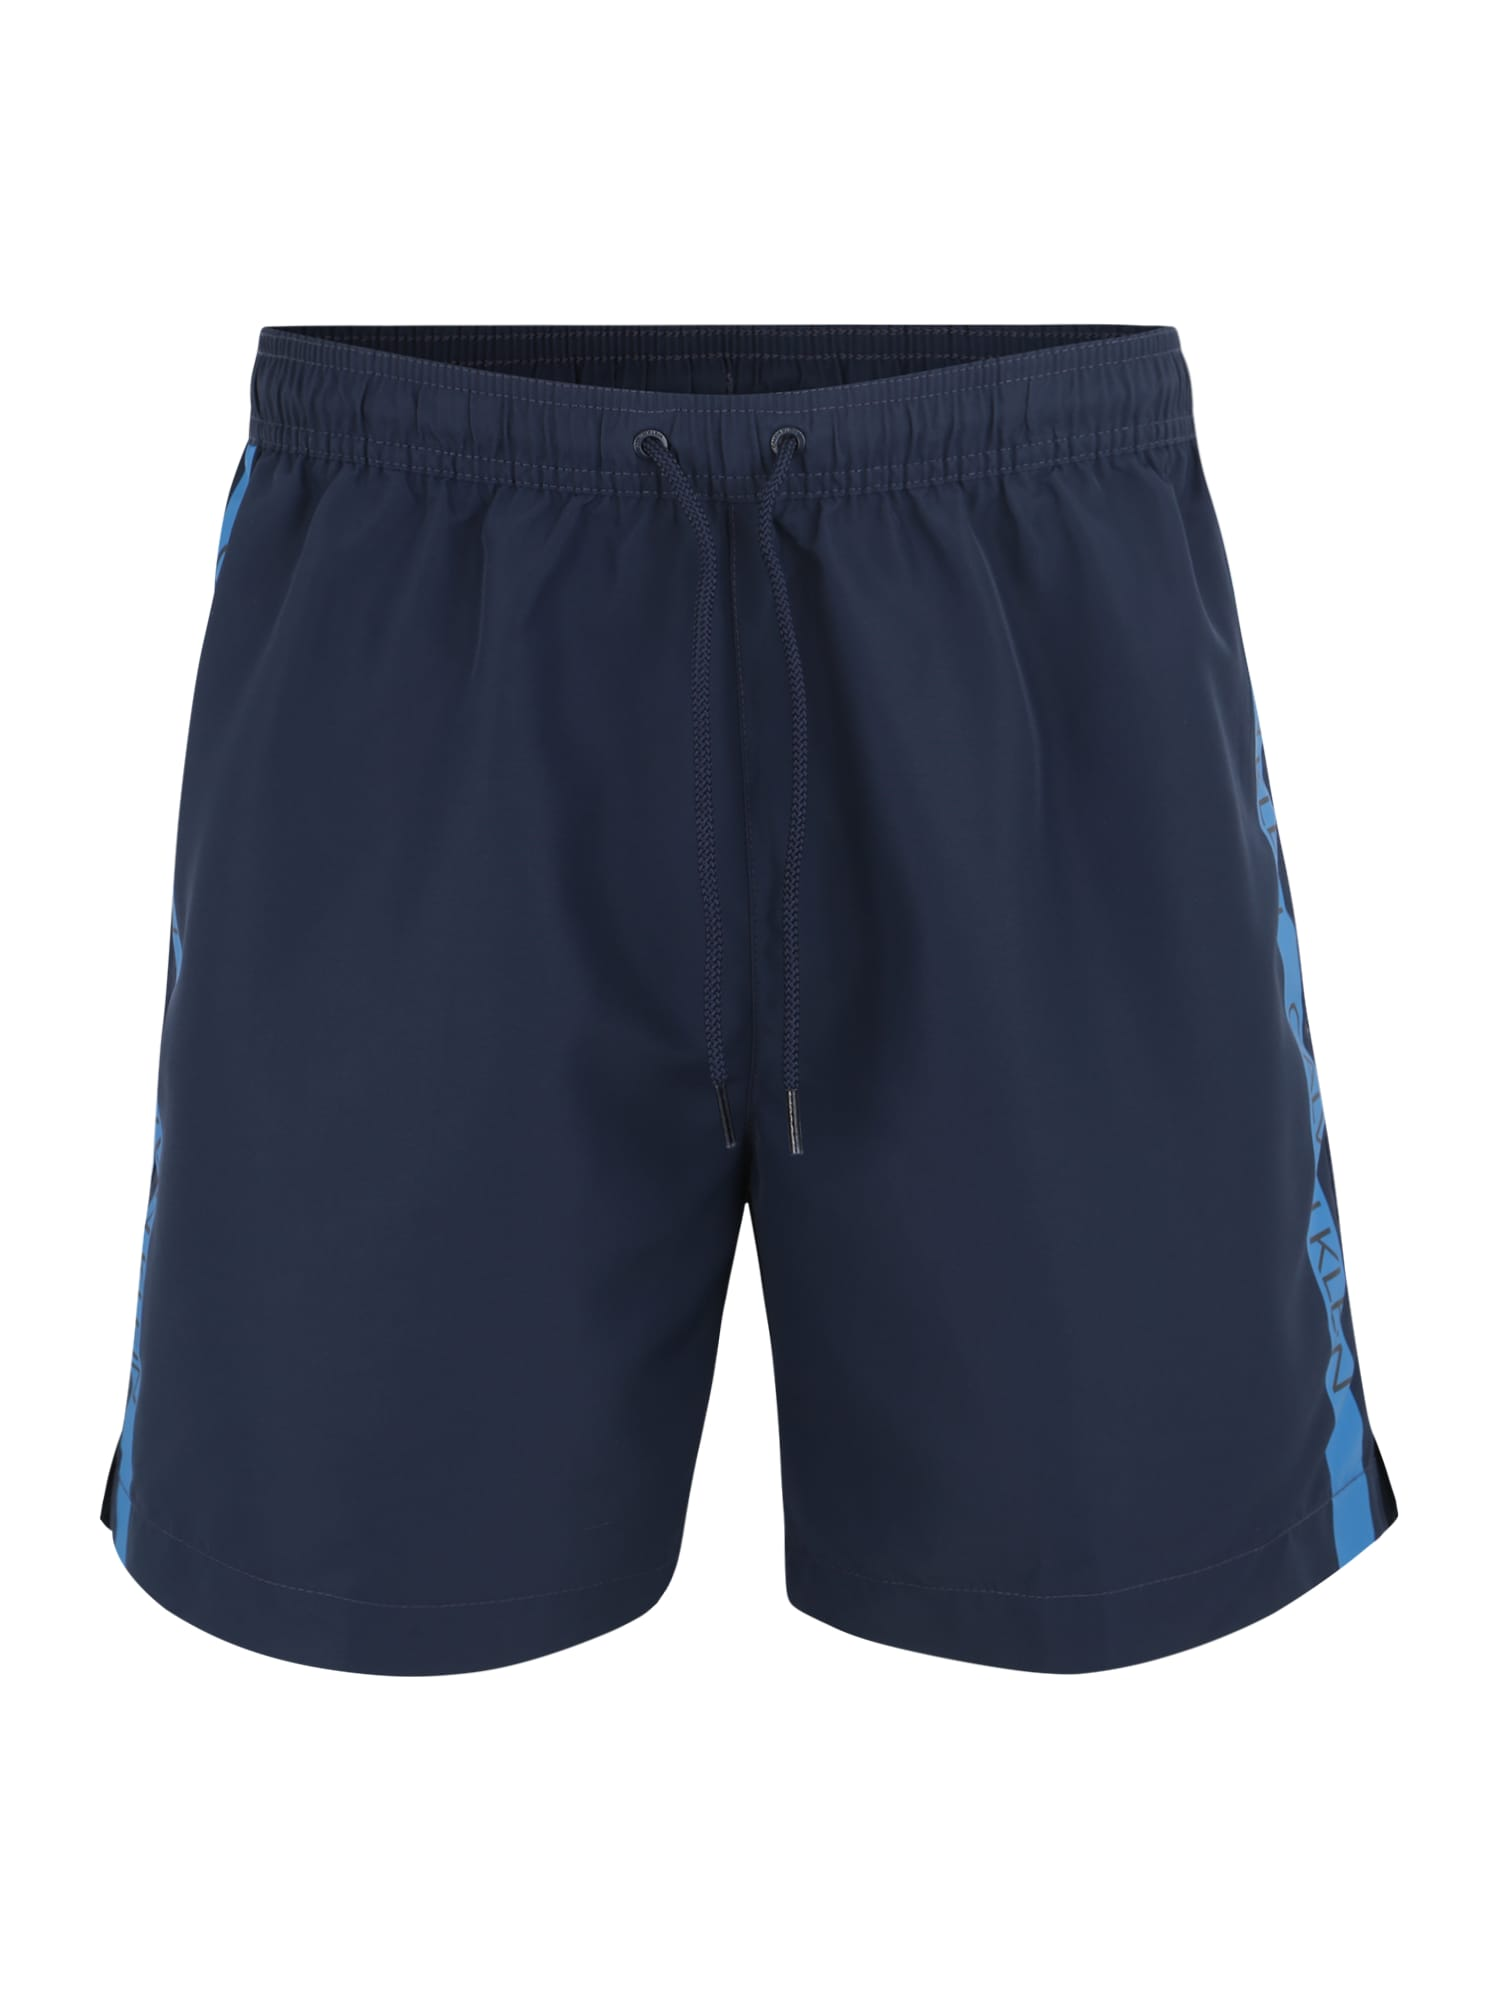 Plavecké šortky MEDIUM DRAWSTRING tmavě modrá Calvin Klein Swimwear